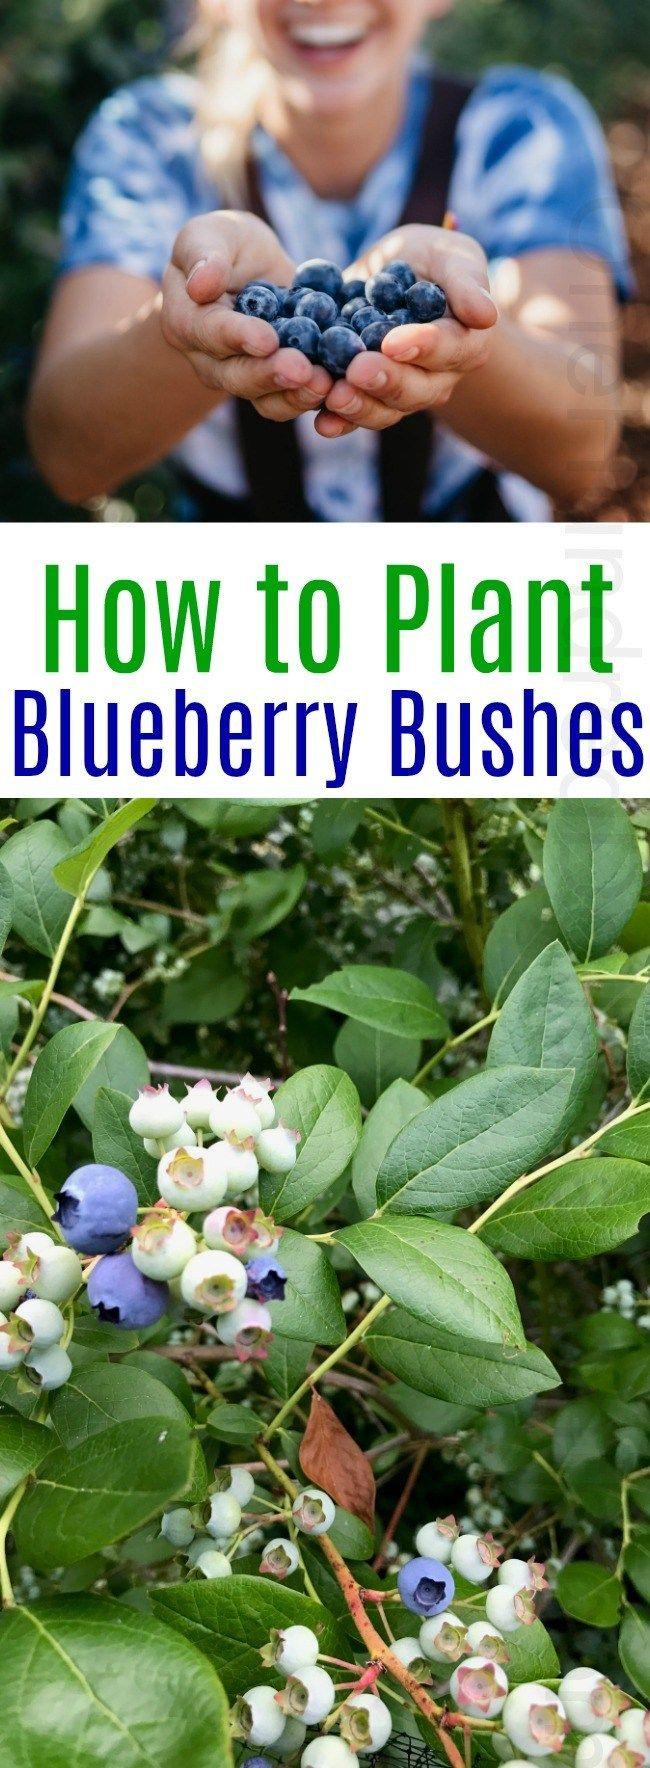 13 planting healthy ideas